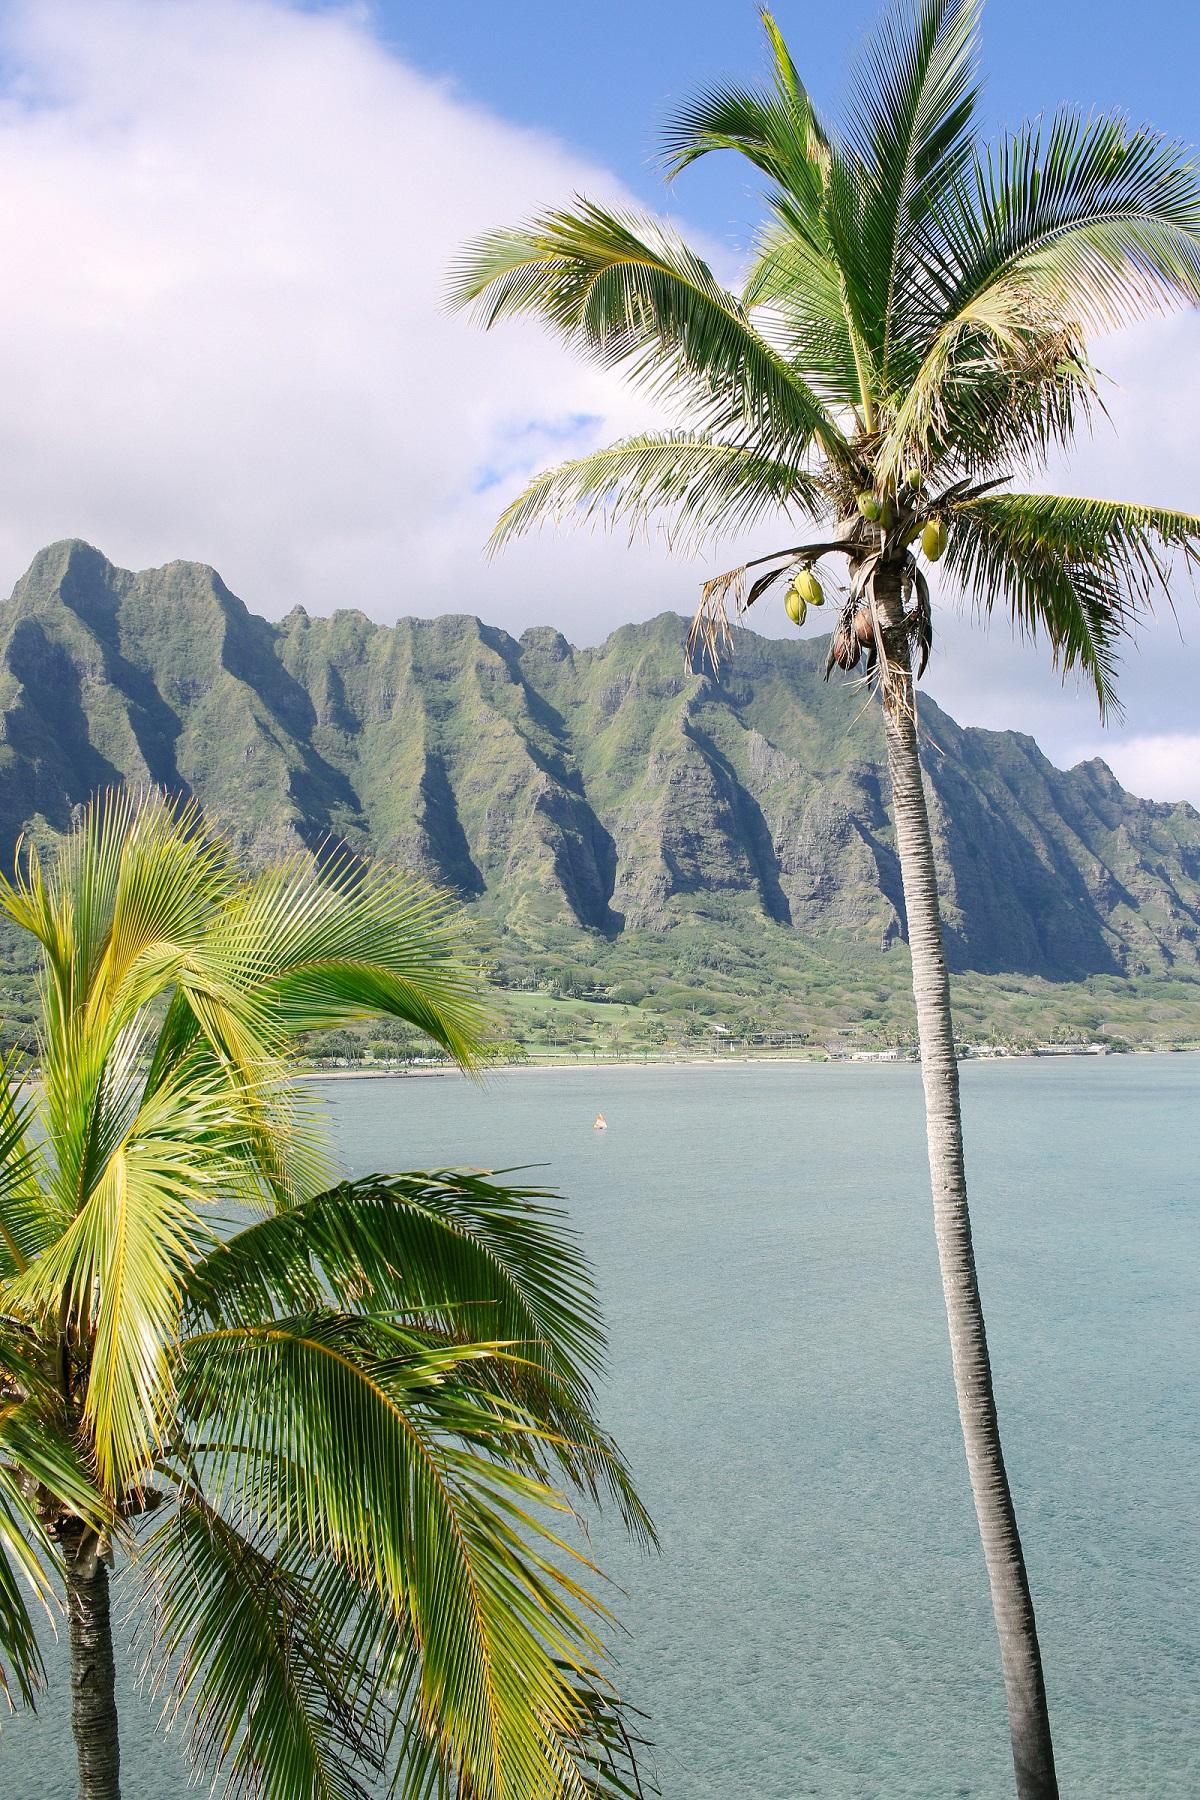 Hawaii Mountains and Beach